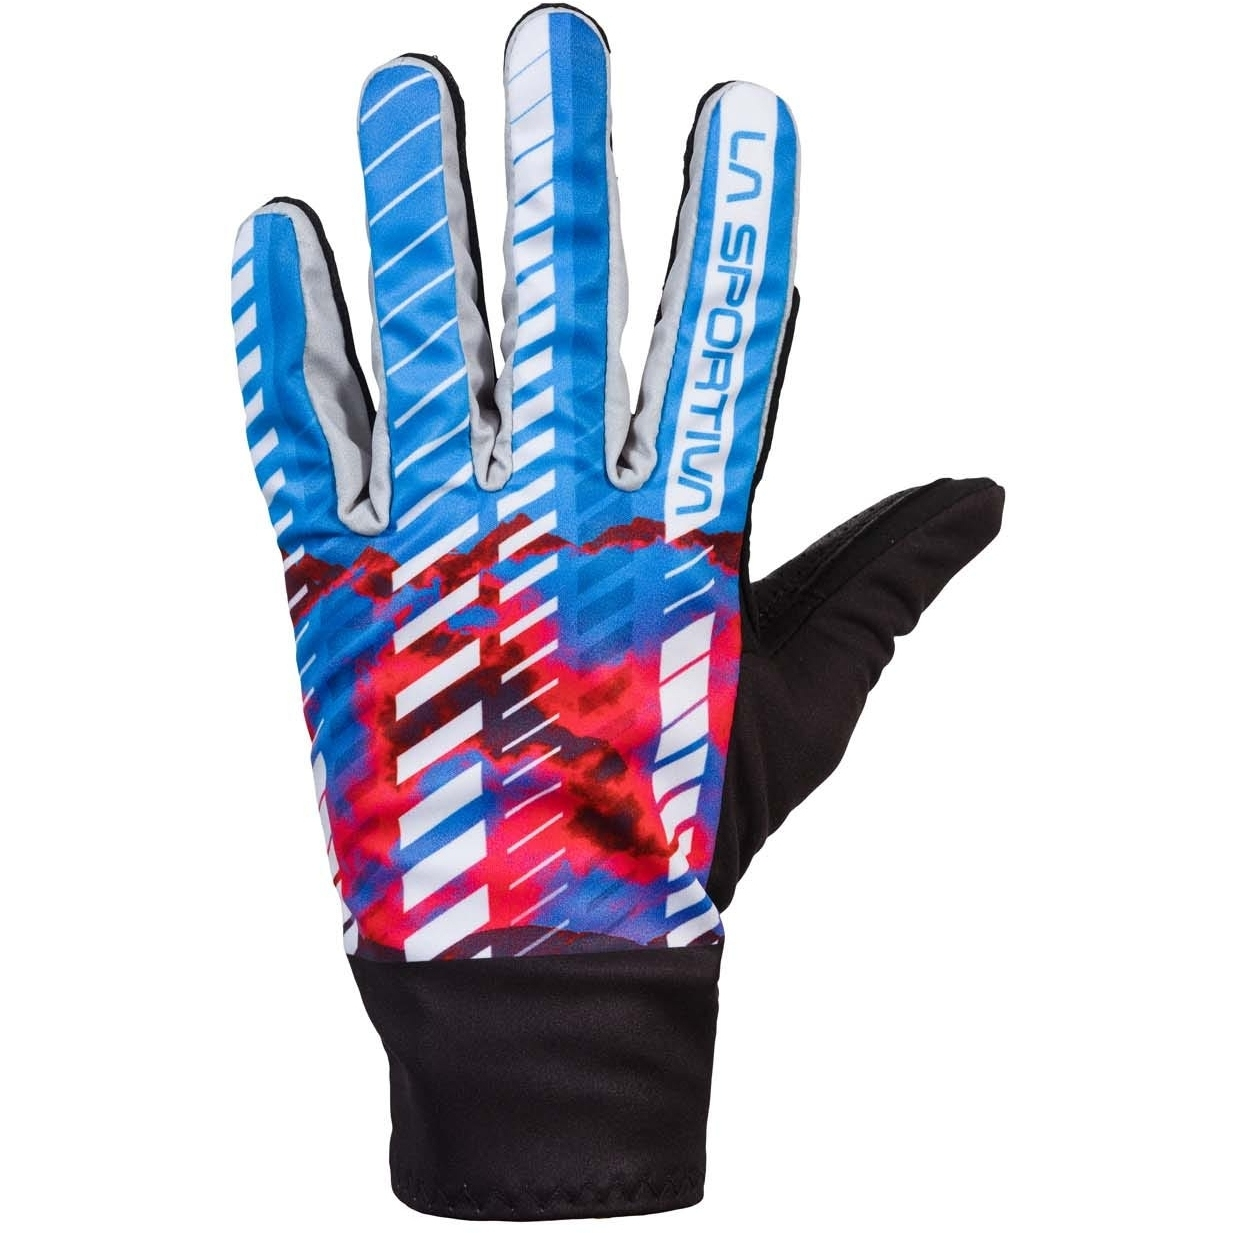 La Sportiva Skimo Race Gloves Women - Malibu Blue/Hibiscus